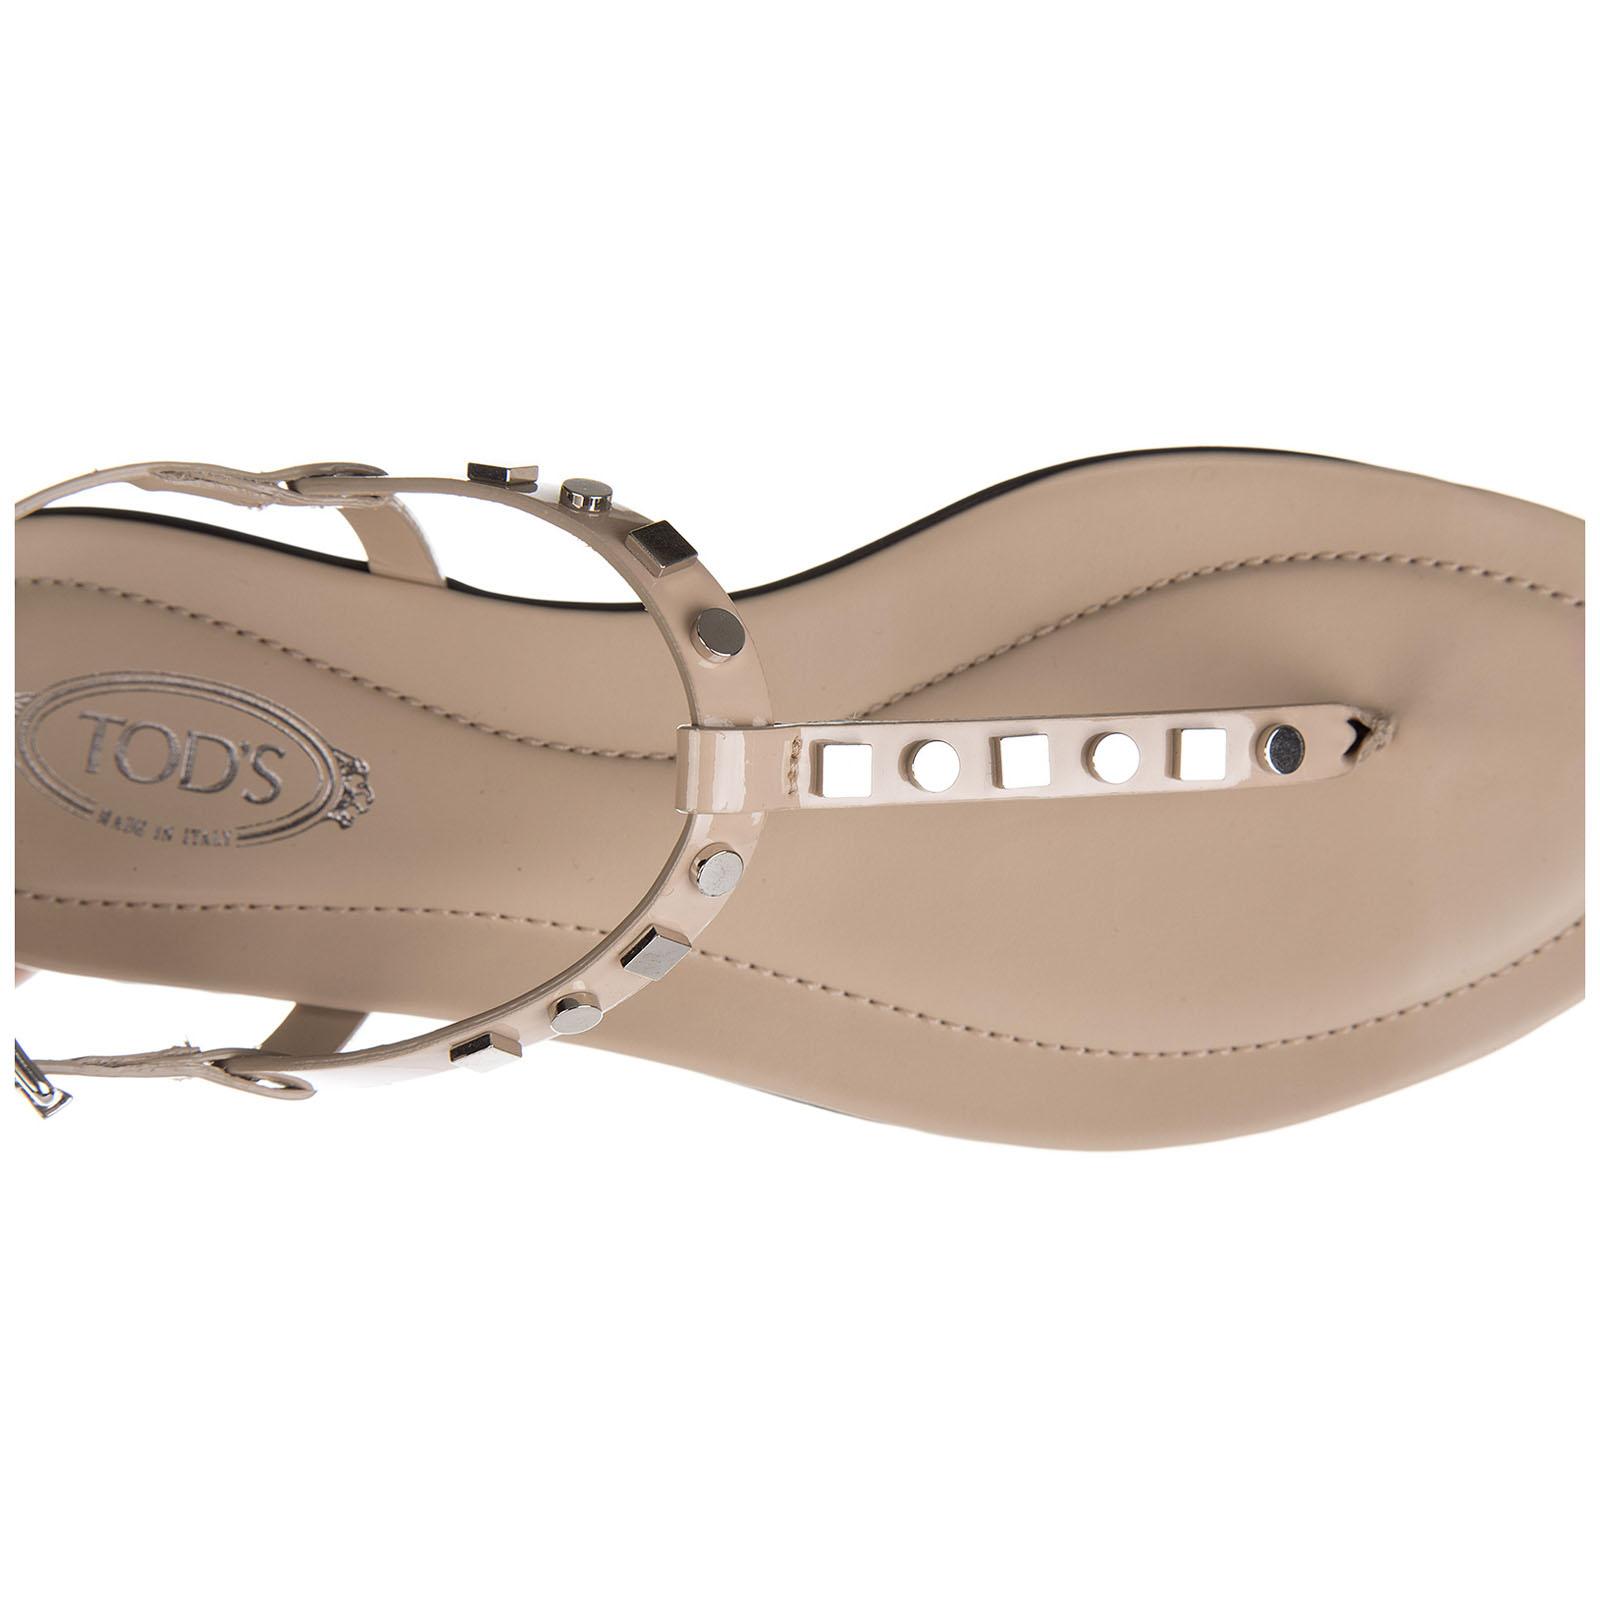 Damen leder flip flops zehentrenner sandalen